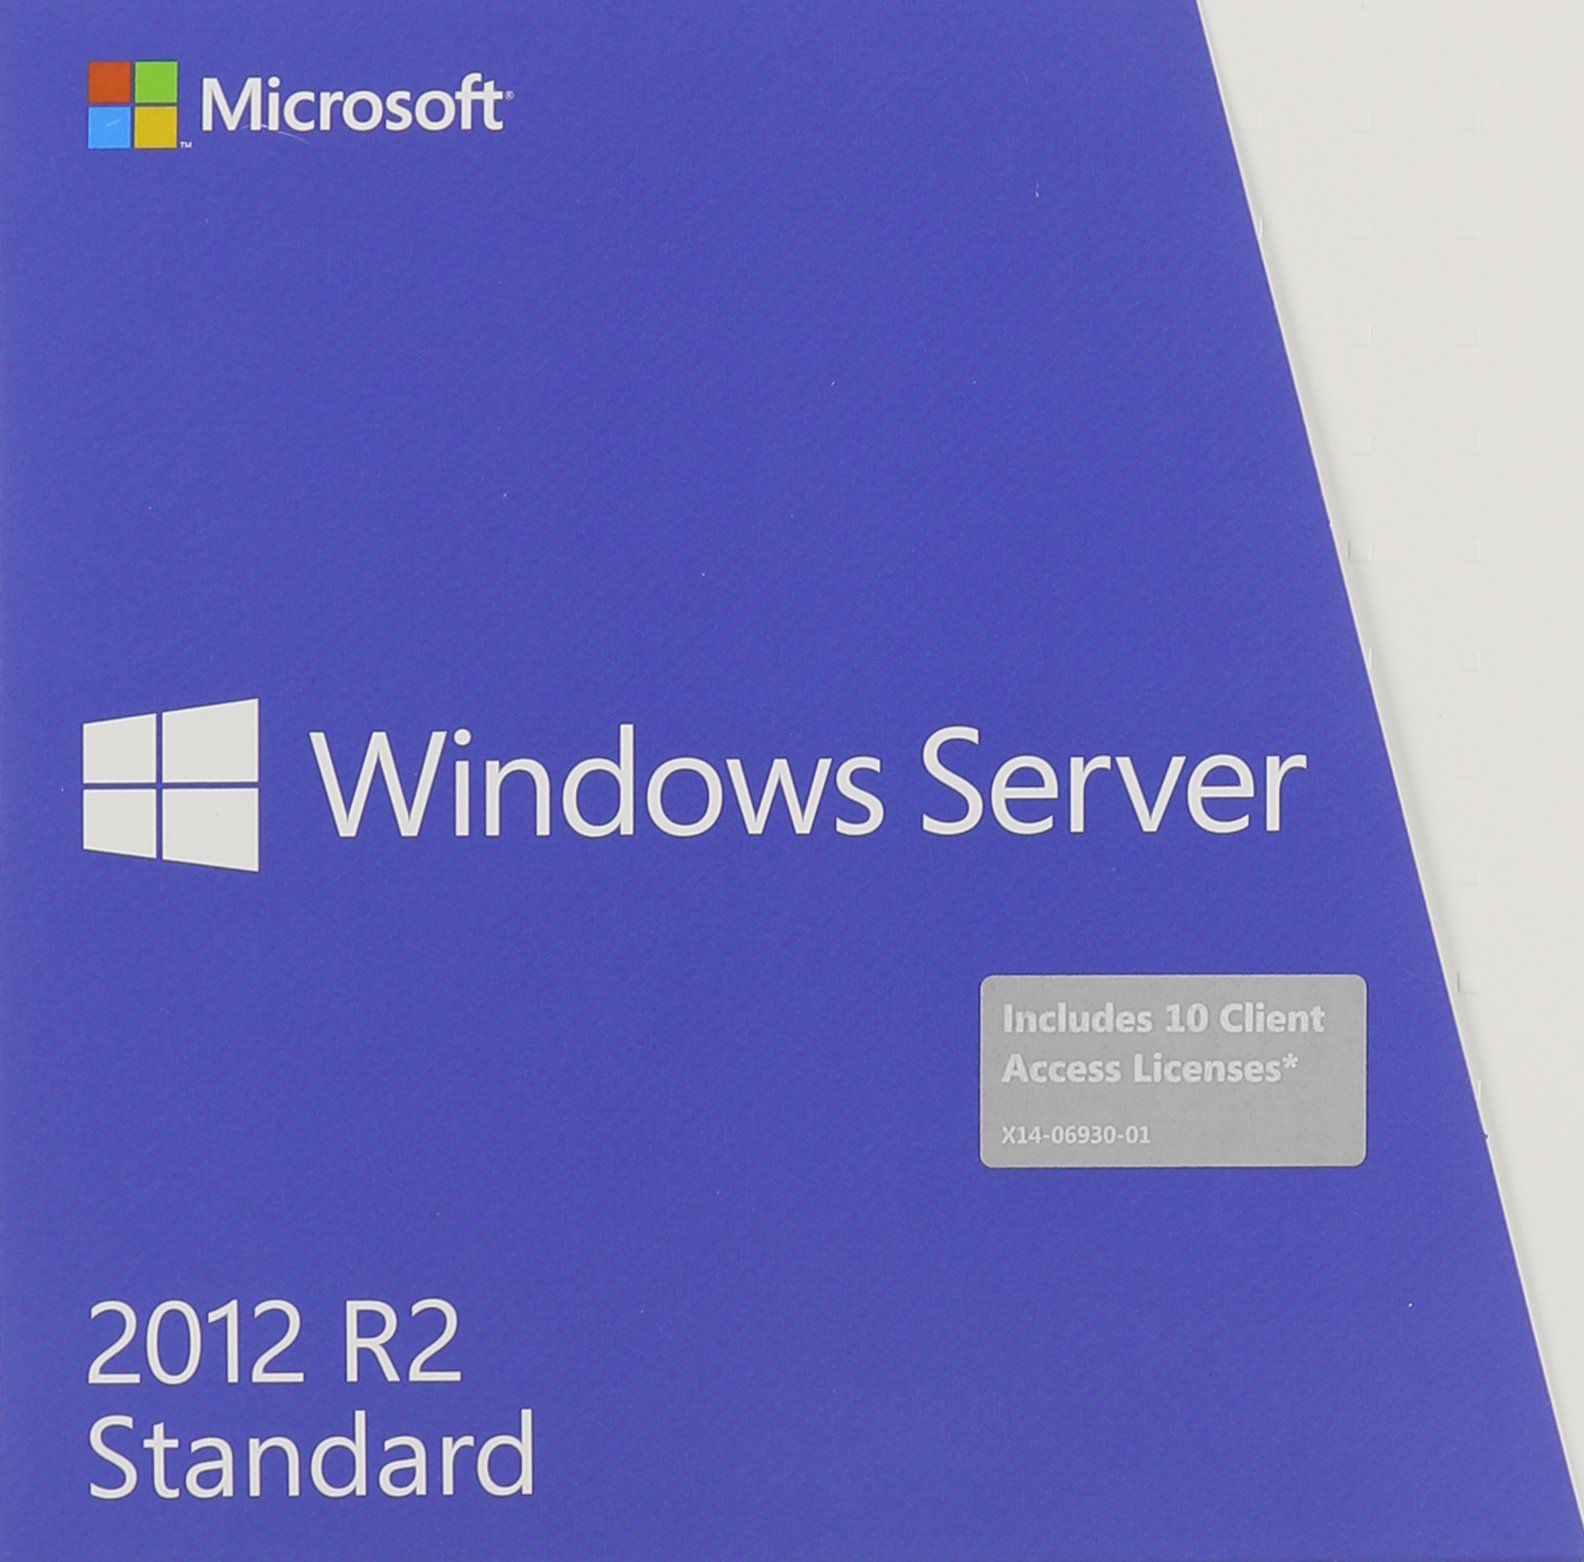 Microsoft Windows Server Standard 2012 R2 64 Bit English DVD 10 Clt by Microsoft